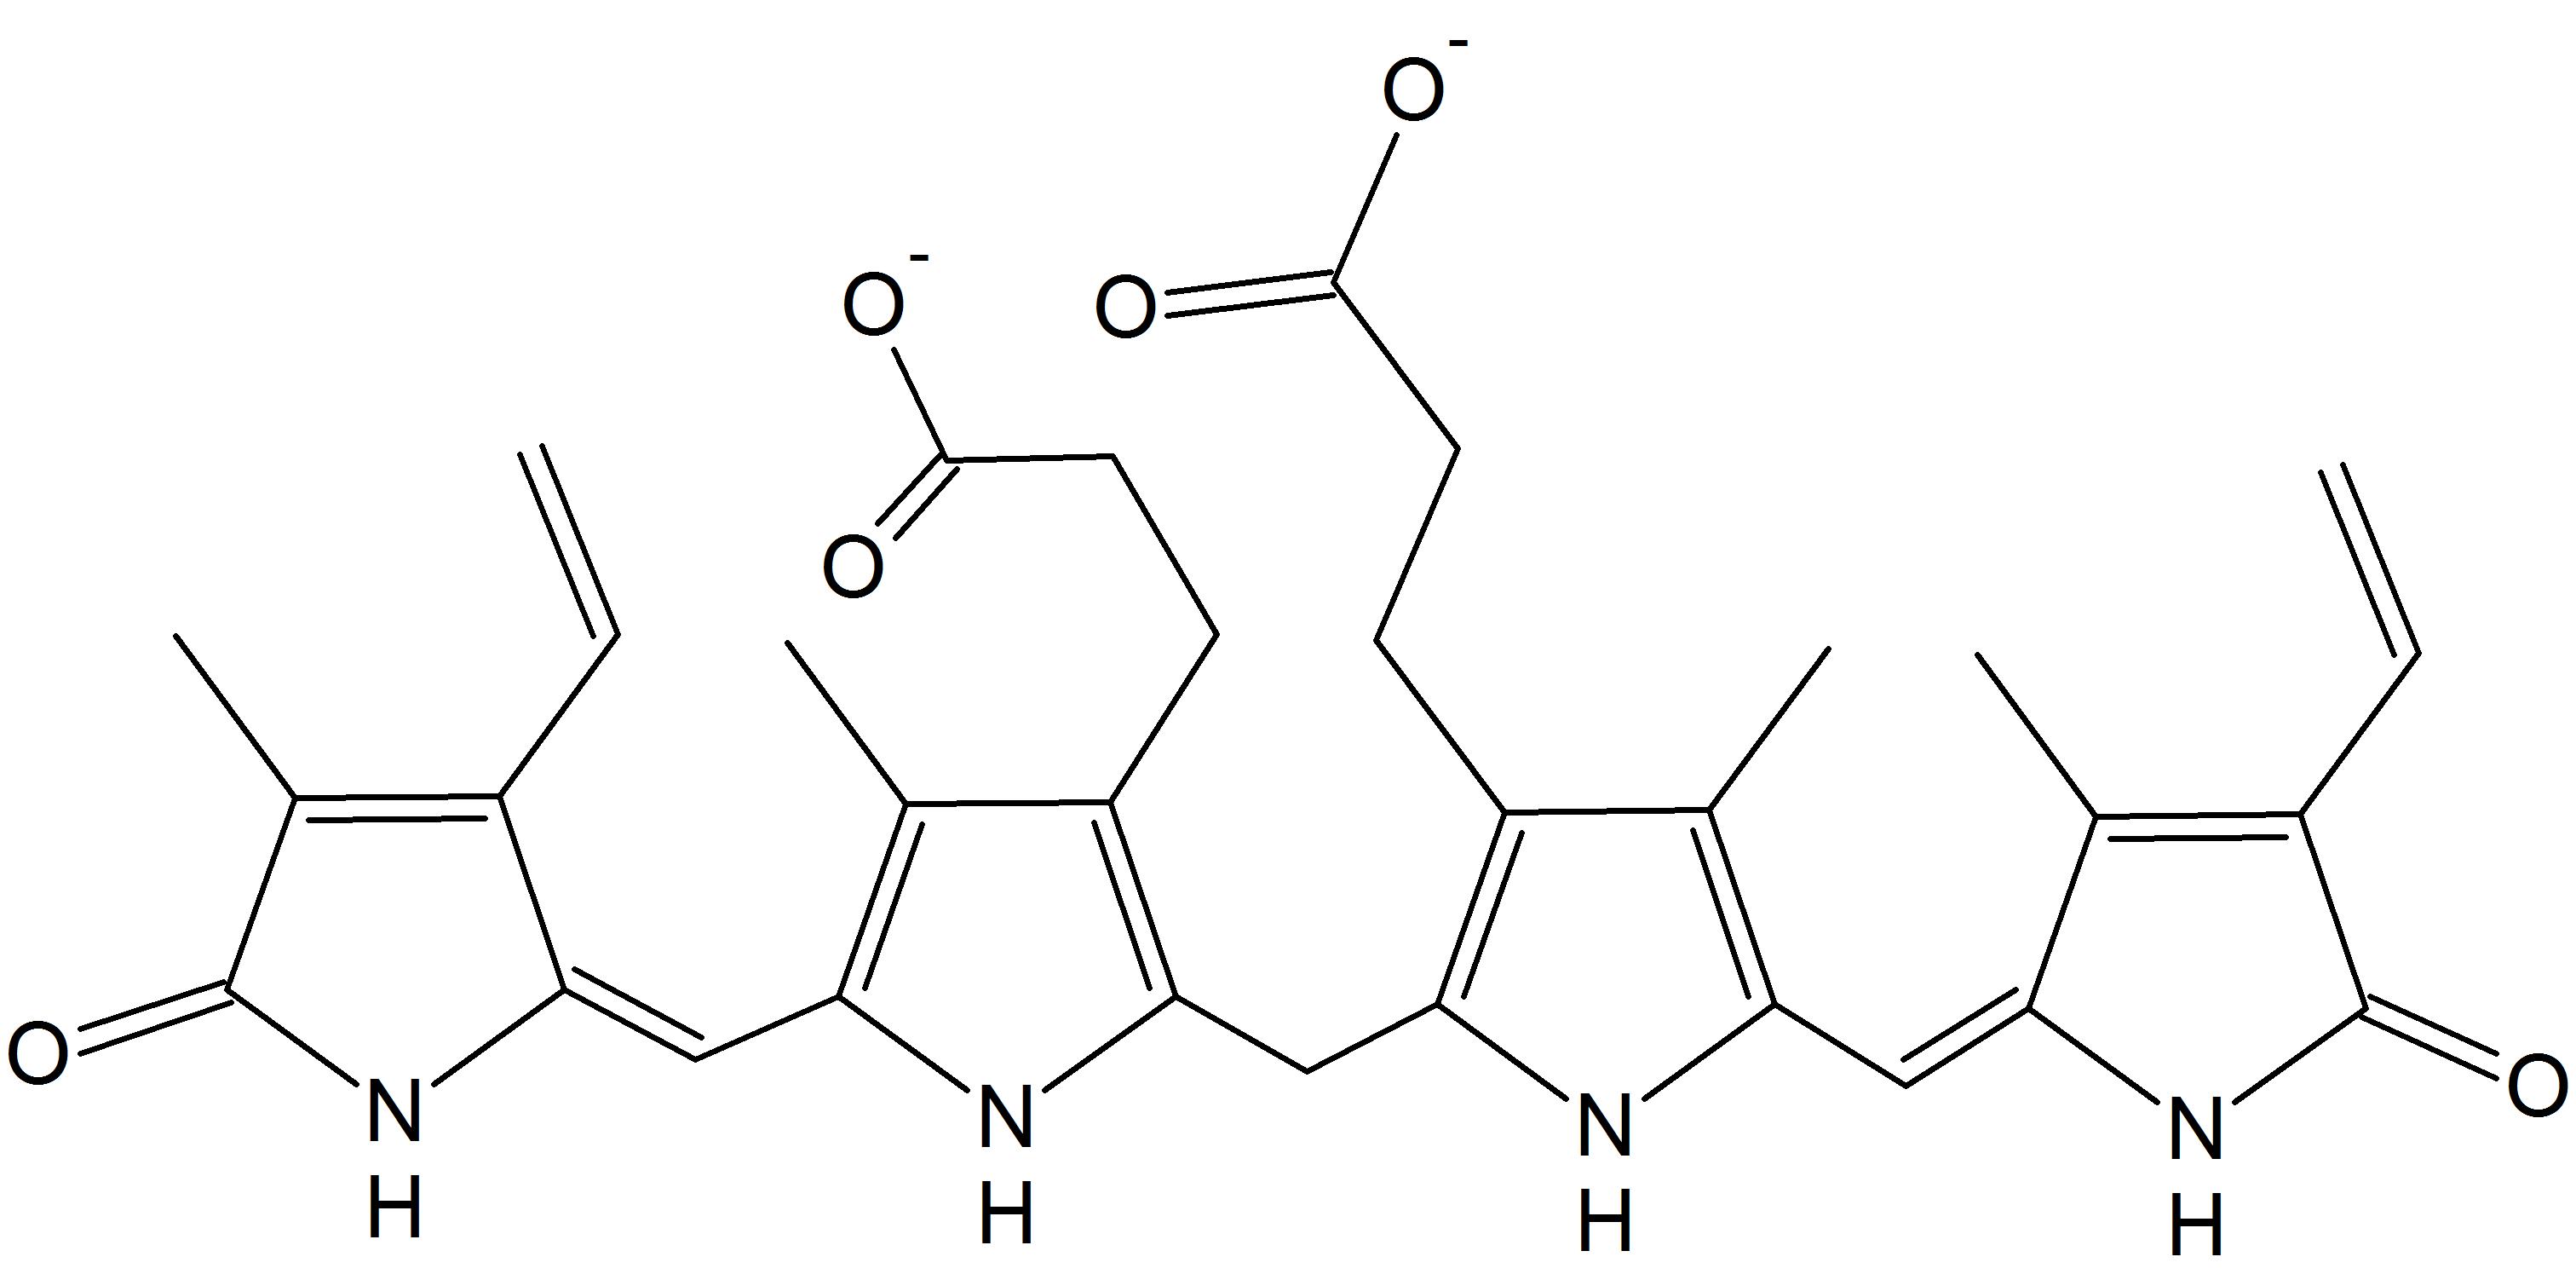 file:structure of bilirubin - wikimedia commons, Skeleton